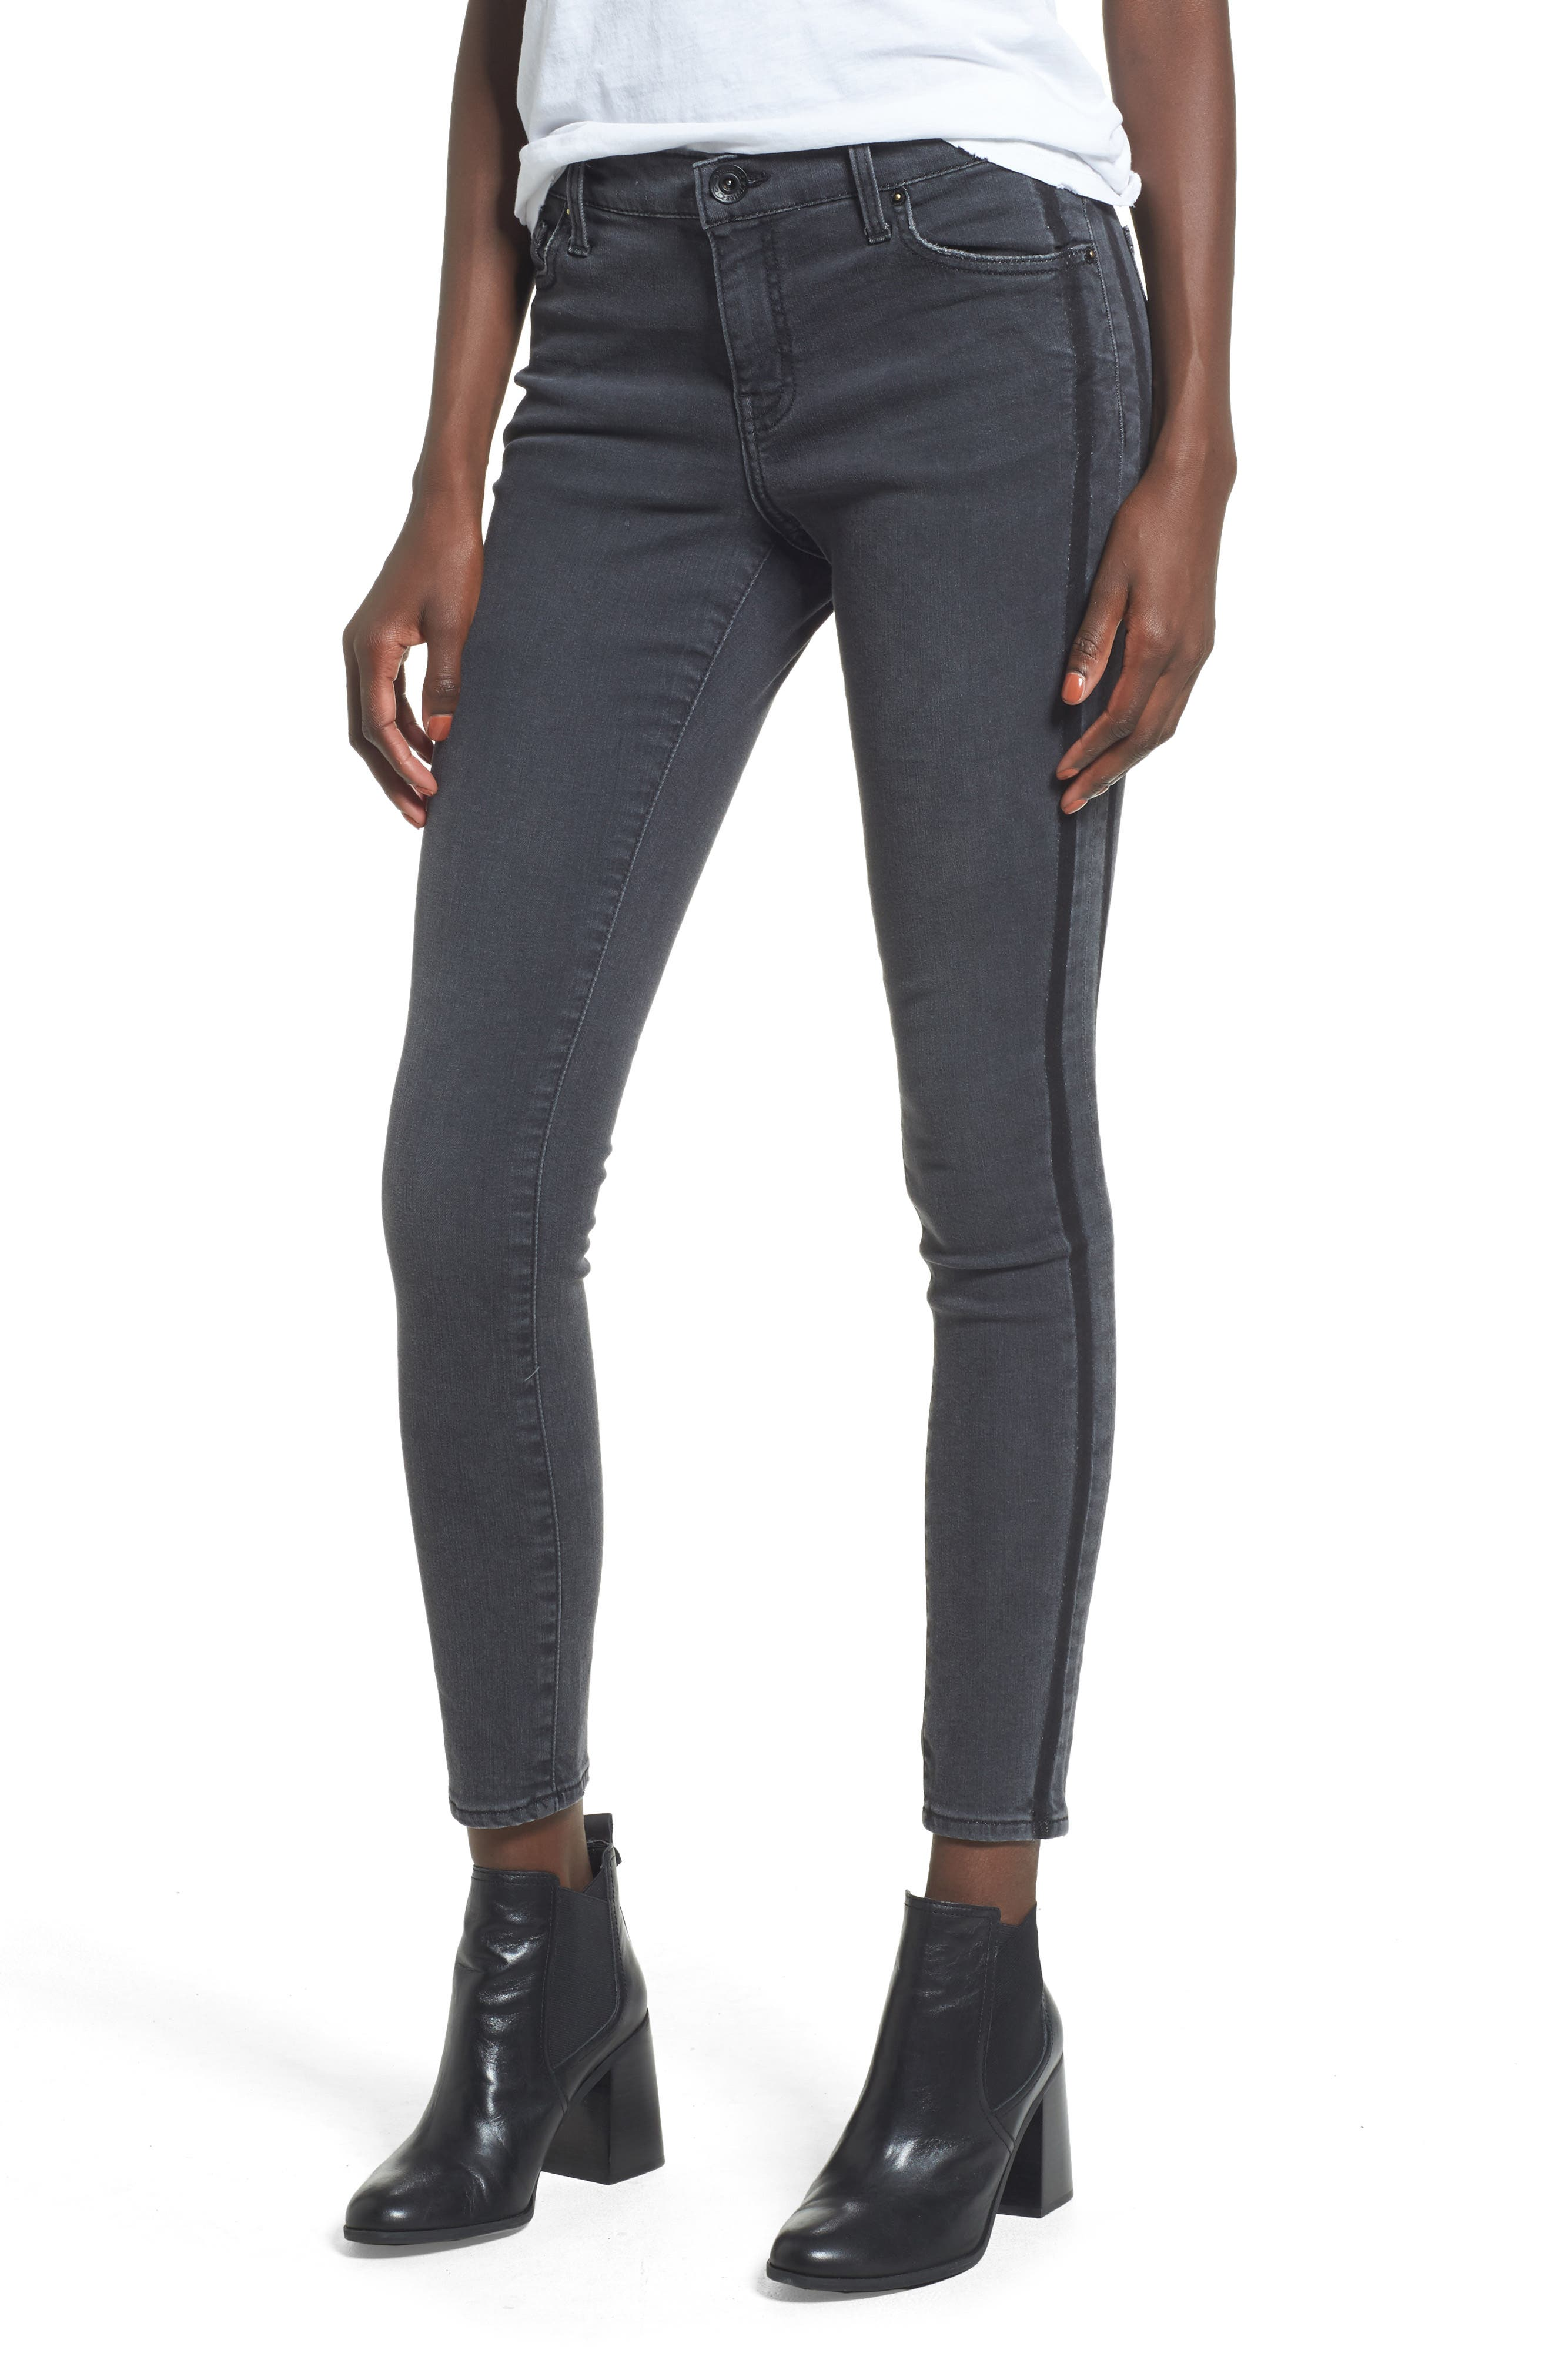 Lola Skinny Jeans,                             Main thumbnail 1, color,                             Carlsbad Fest